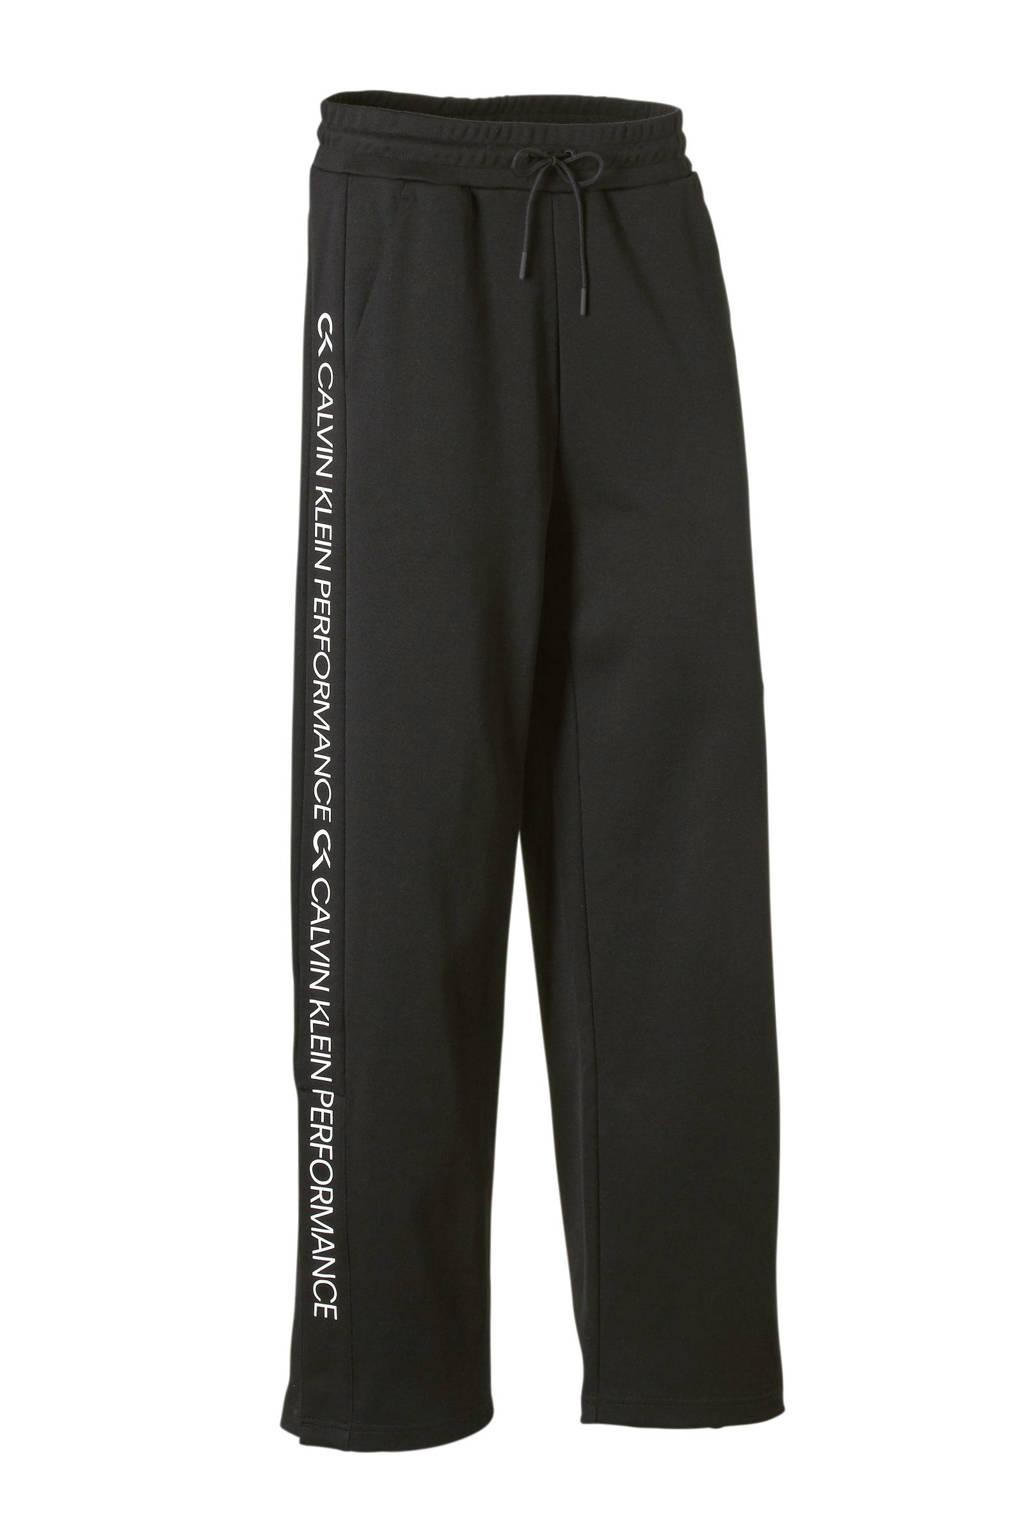 Calvin Klein joggingbroek zwart, Zwart